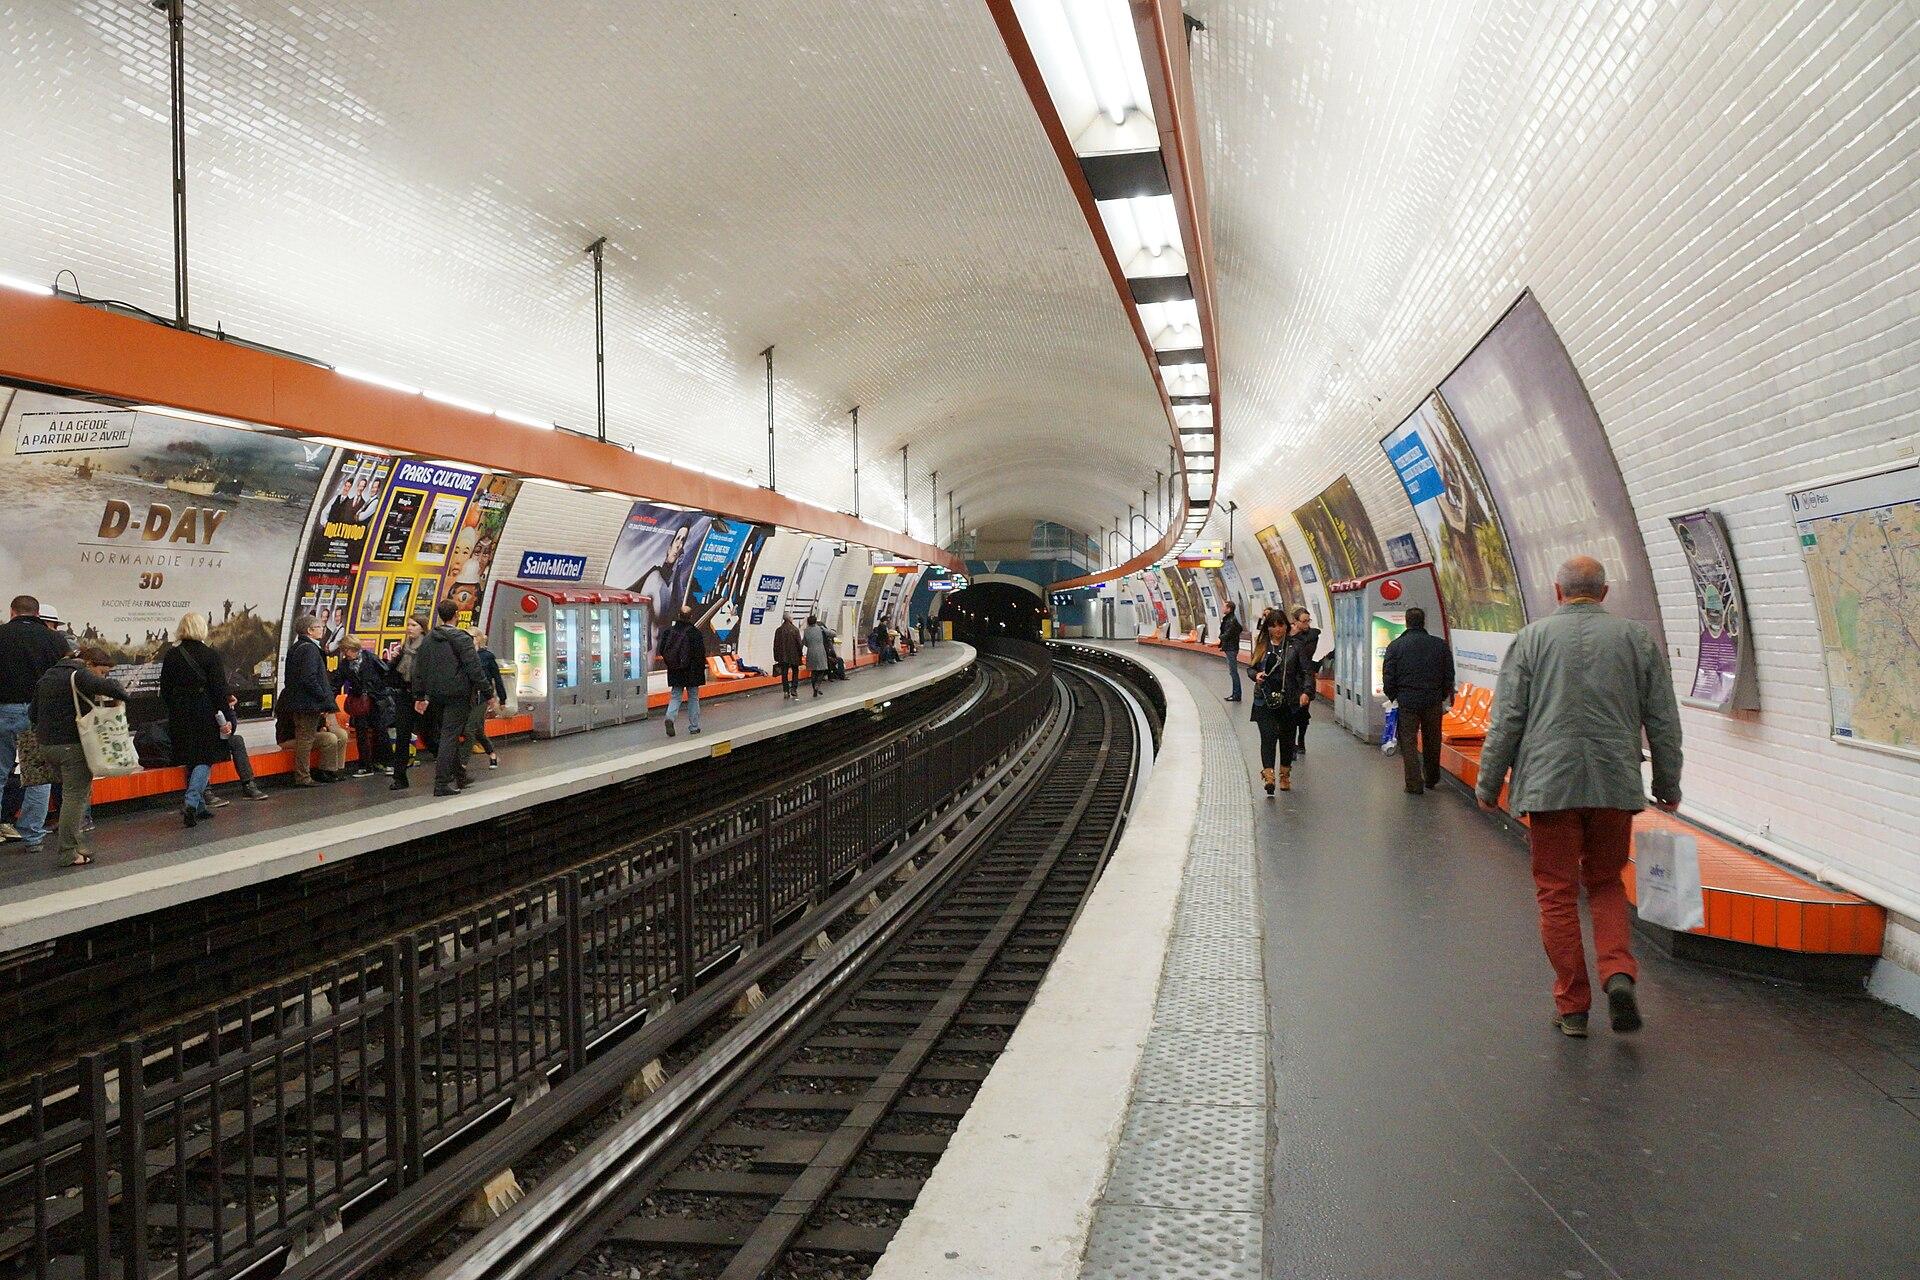 Saint michel m tro paris wikipedia - Metro saint michel paris ...